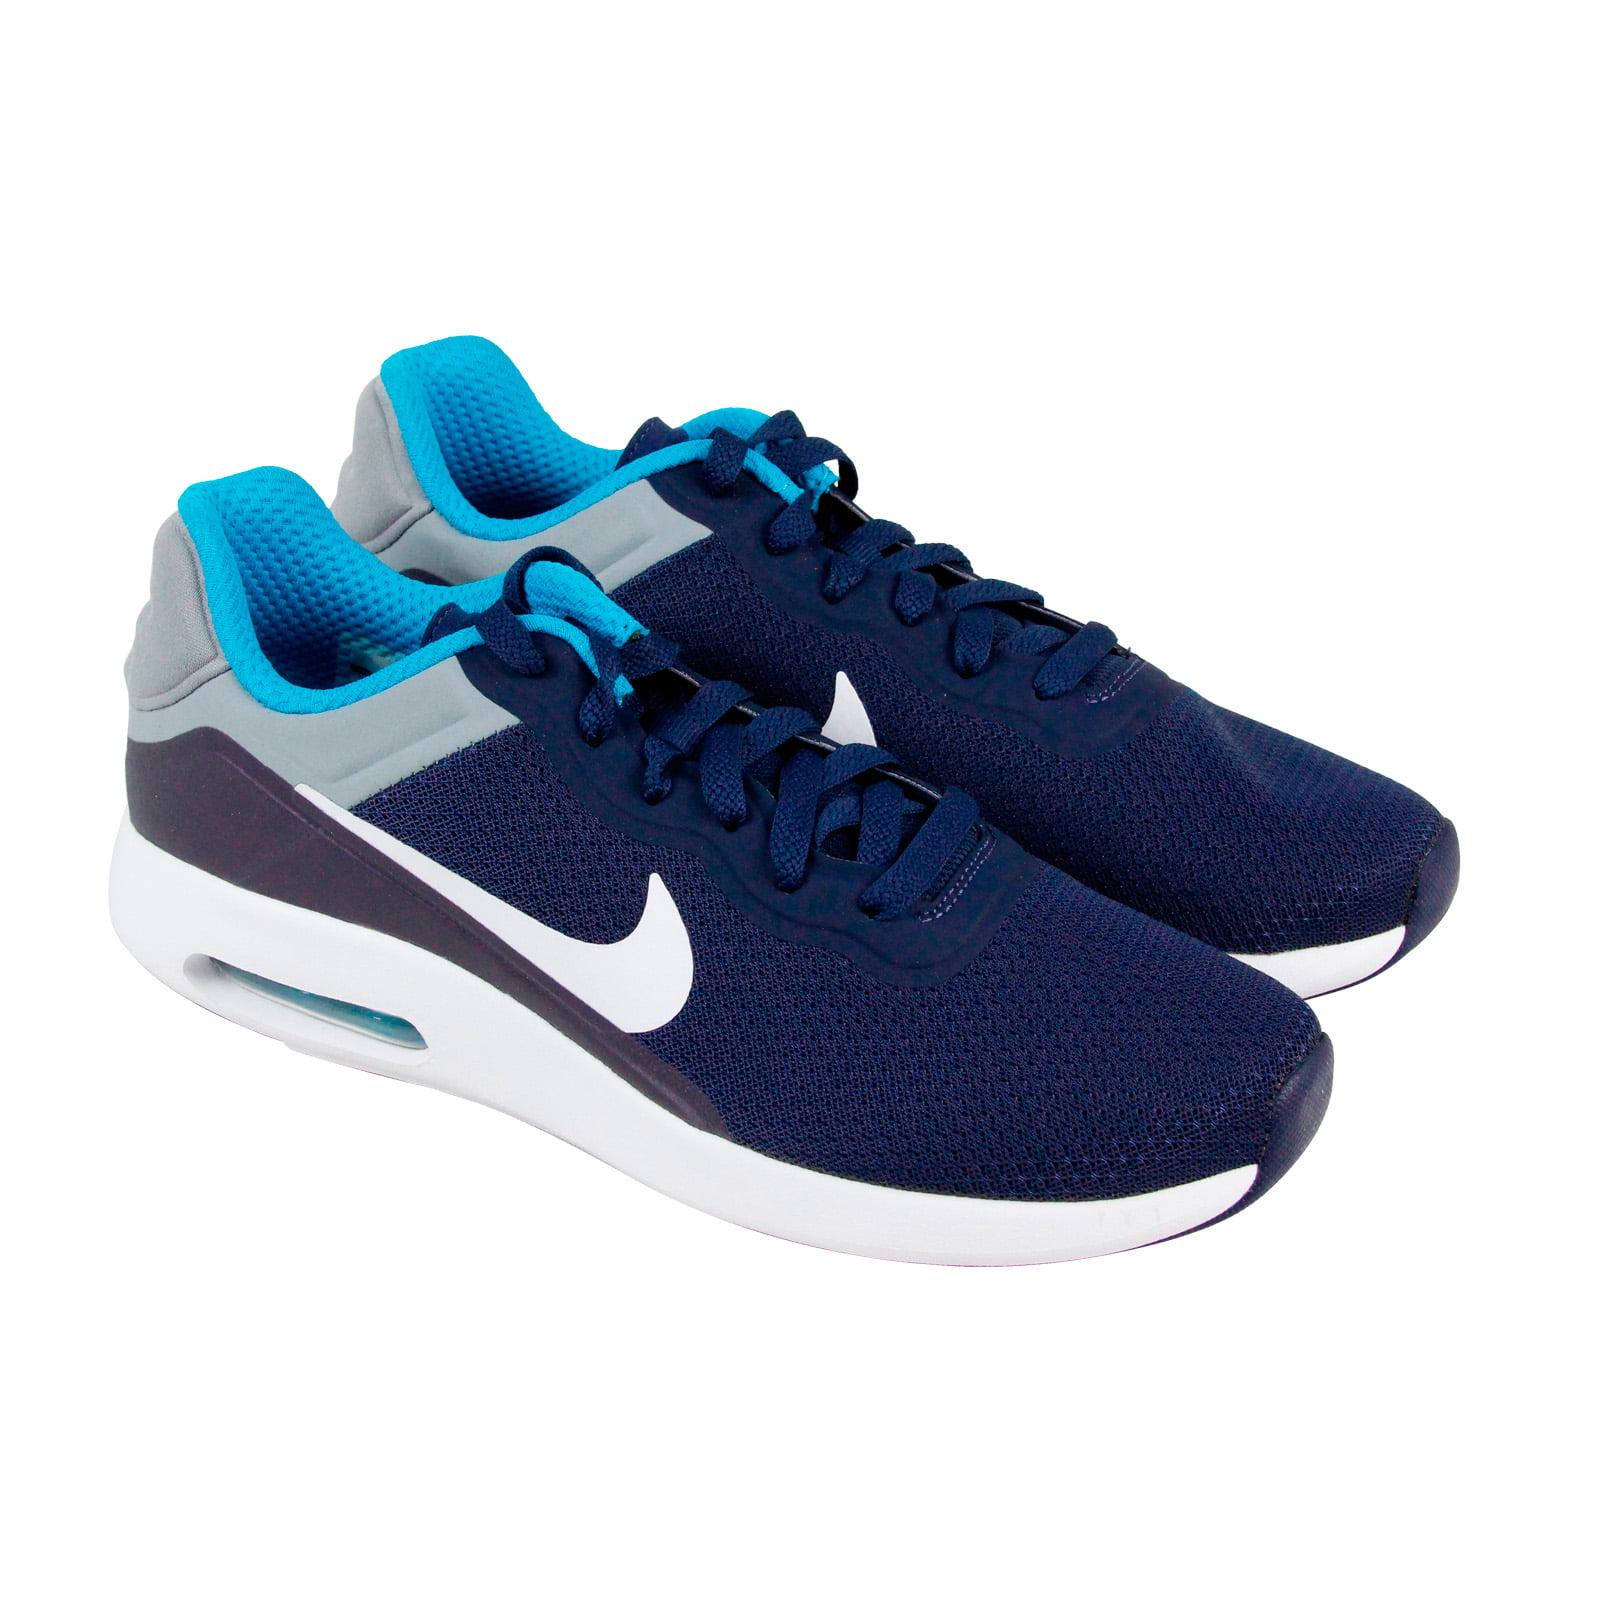 3ff148ecb694 Nike - Nike Nike Air Max Modern Se Mens Blue Mesh Athletic Lace Up ...